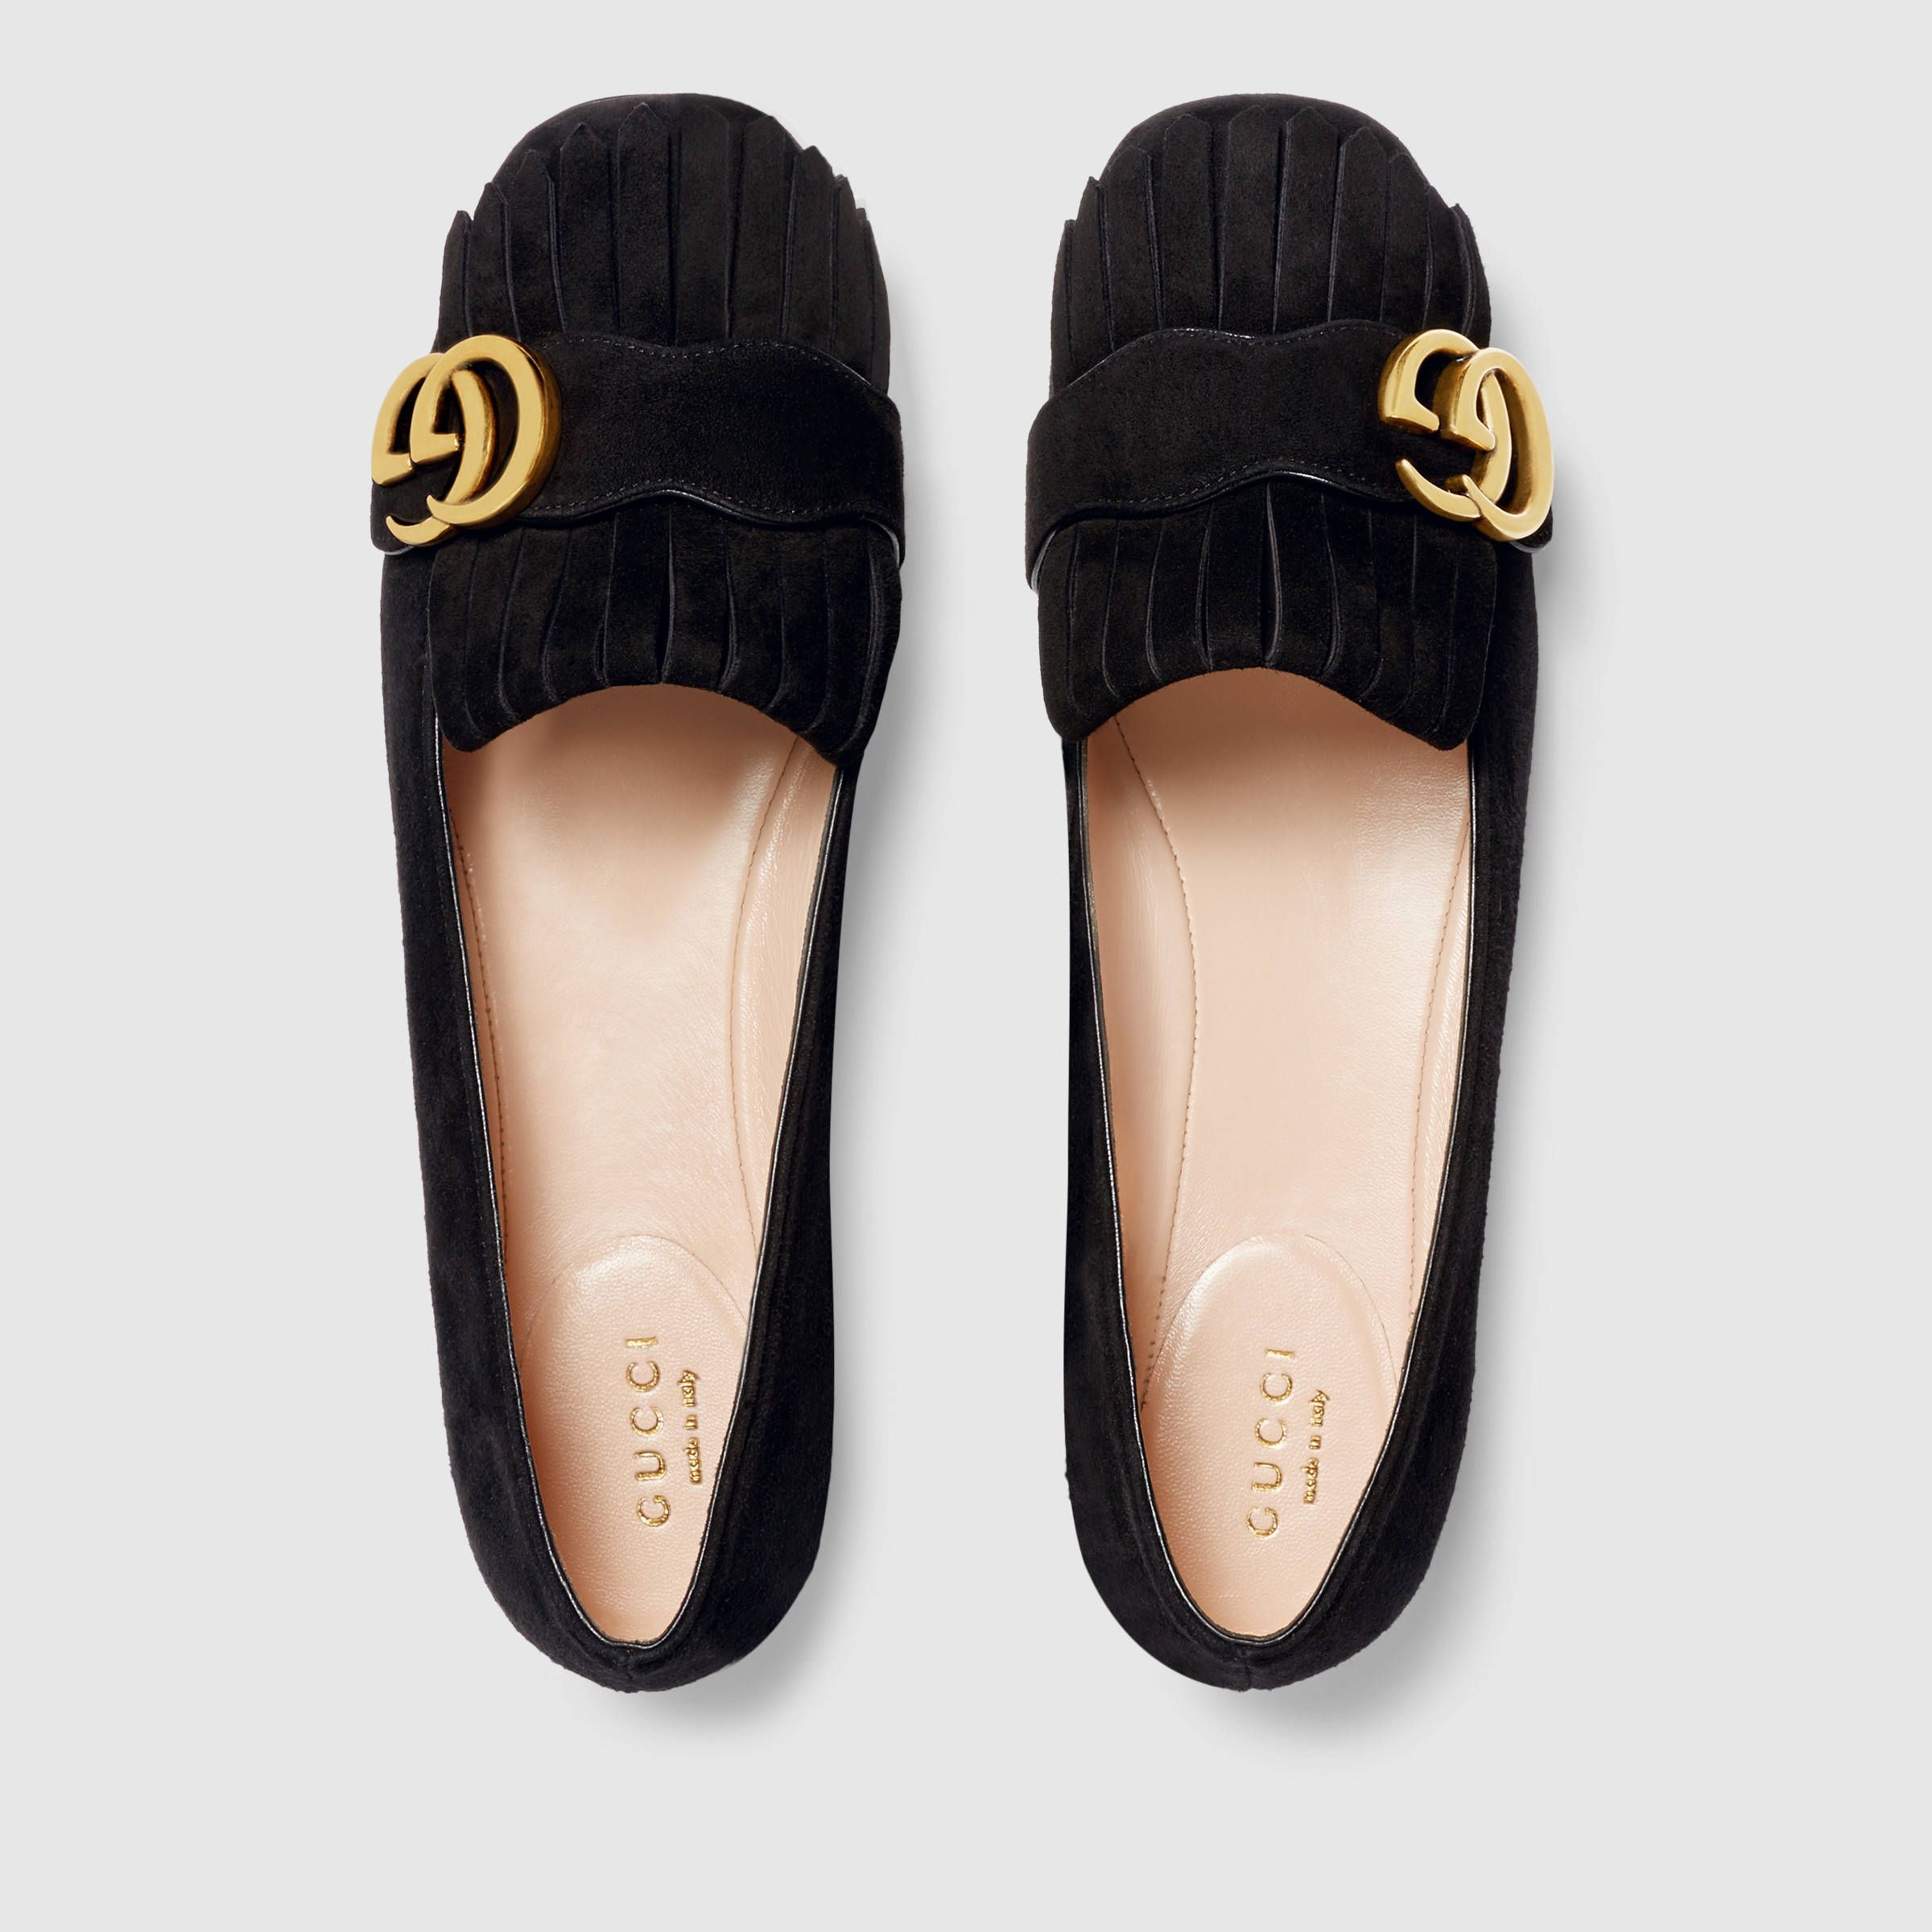 Gucci flats, Gucci flat shoes, Suede